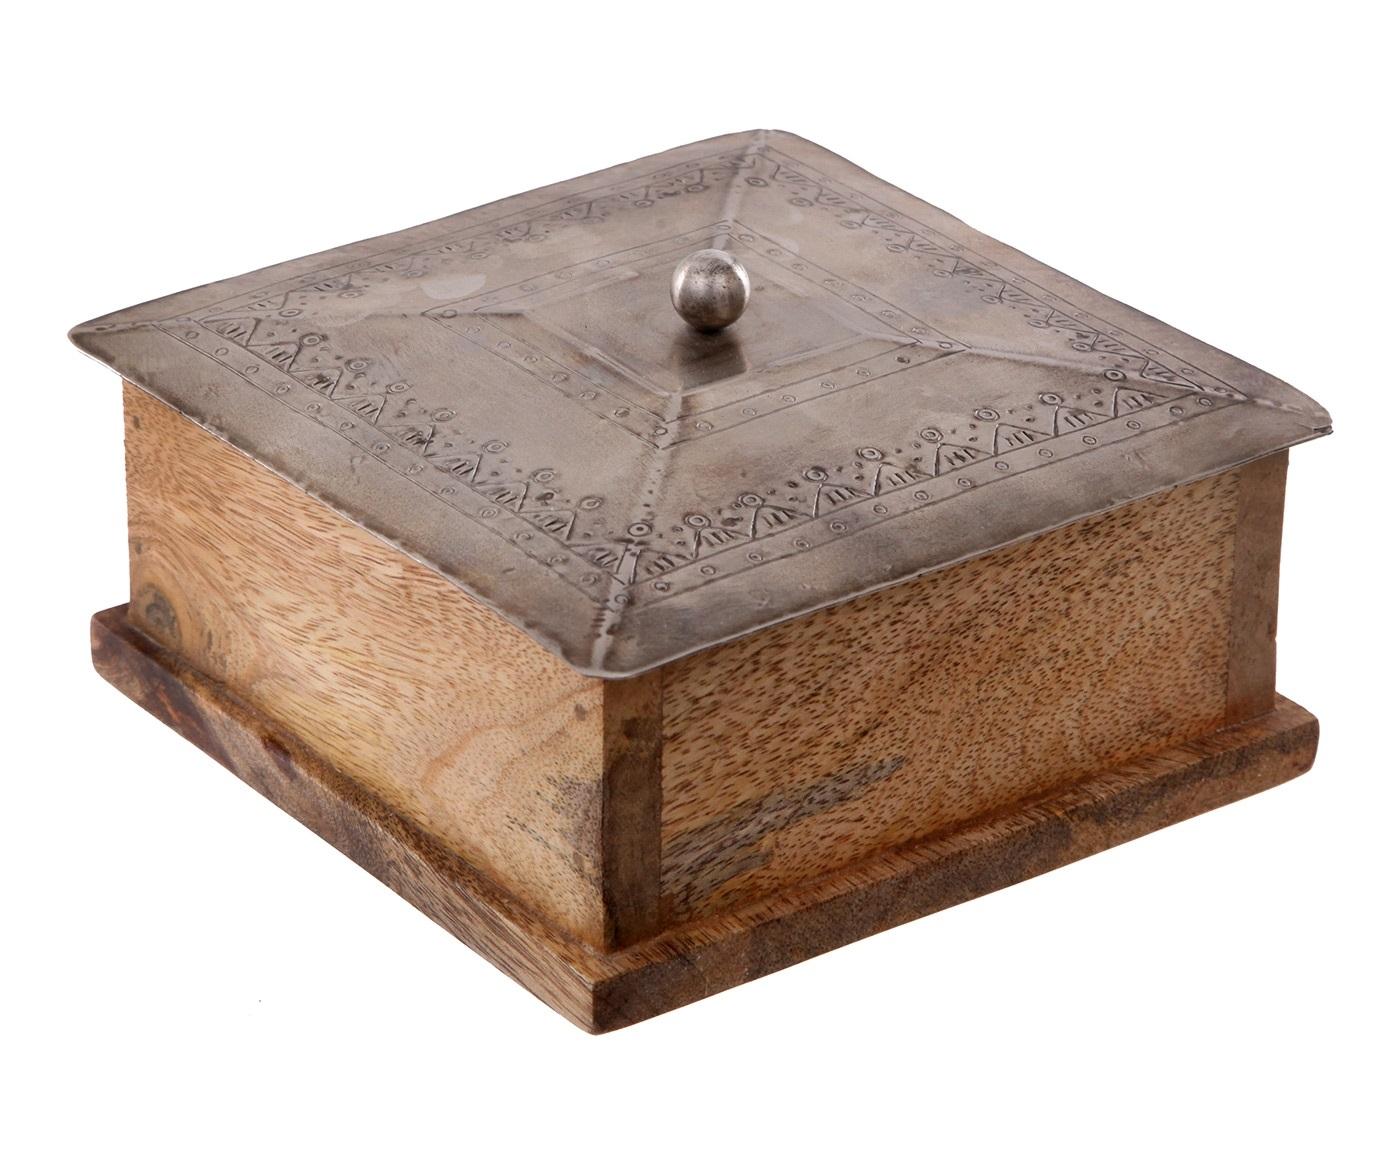 Шкатулка AnticШкатулки<br><br><br>Material: Дерево<br>Length см: None<br>Width см: 14<br>Depth см: 14<br>Height см: 8